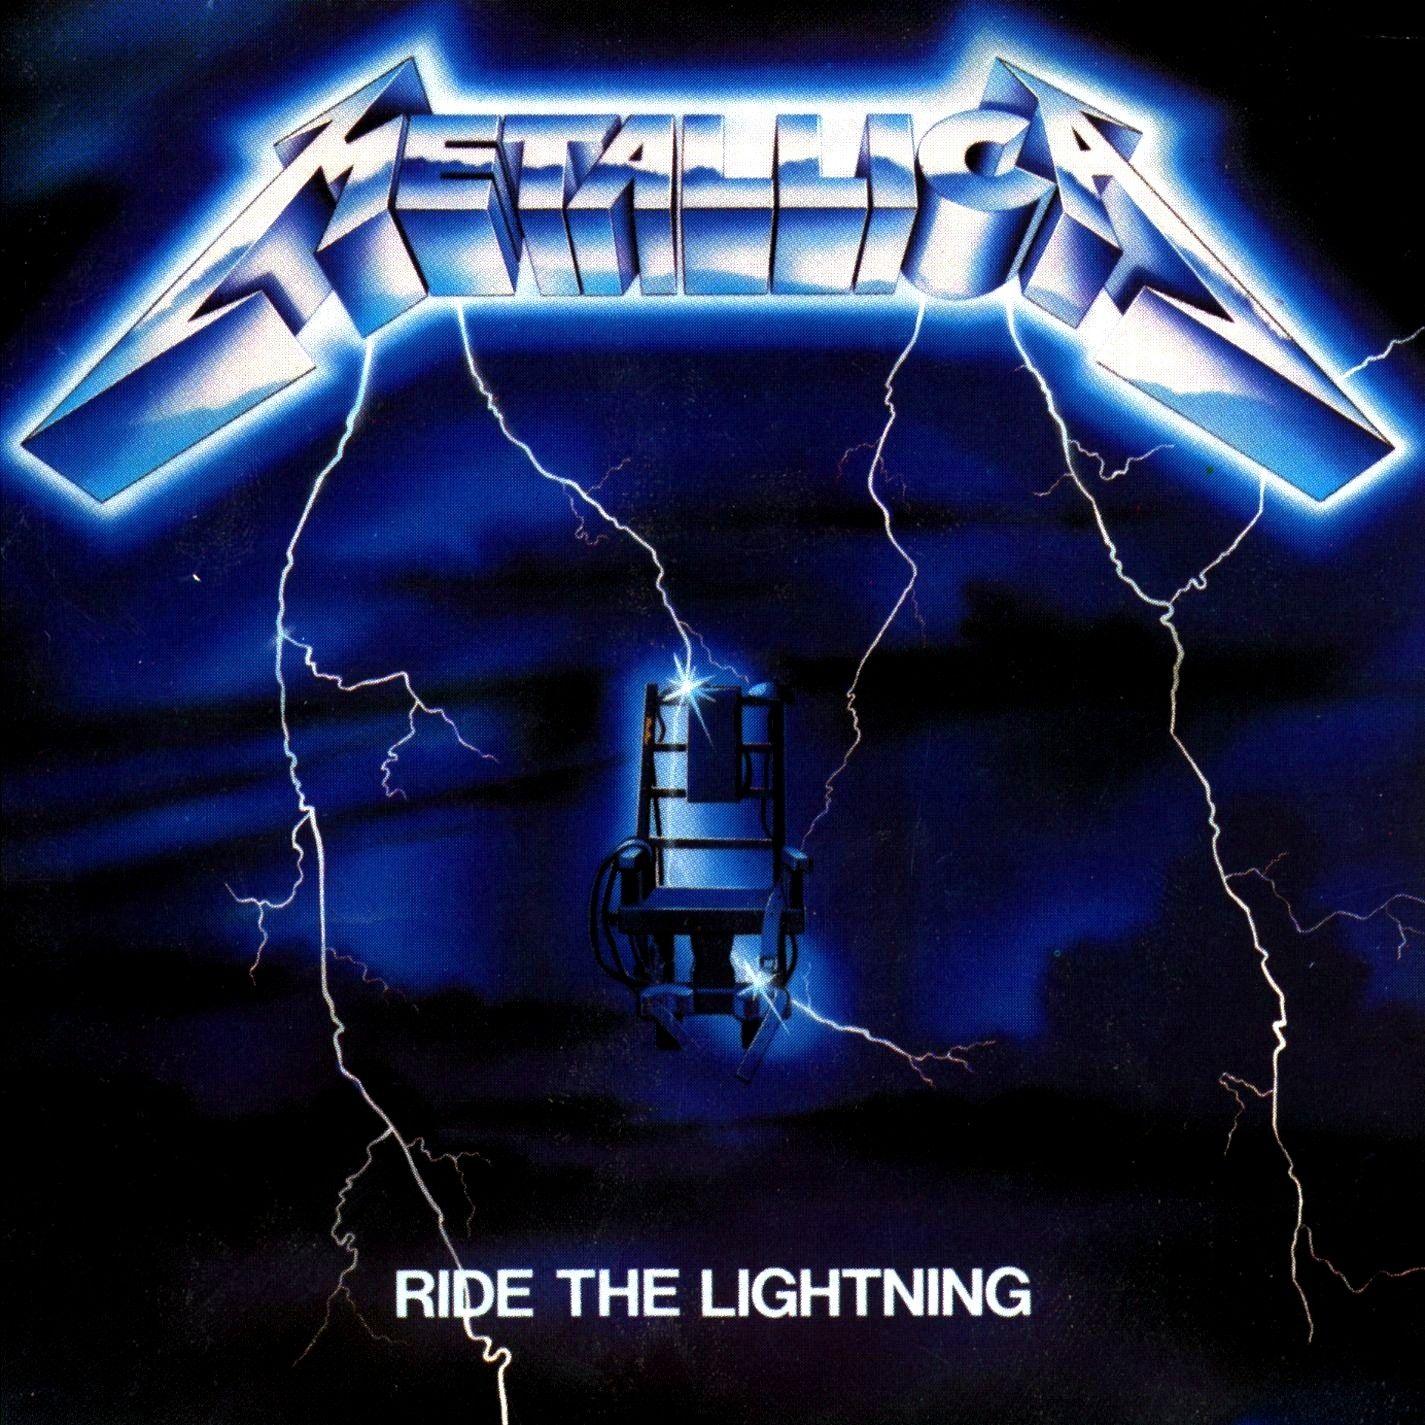 Domingo de Diseño: Ride the Lightning